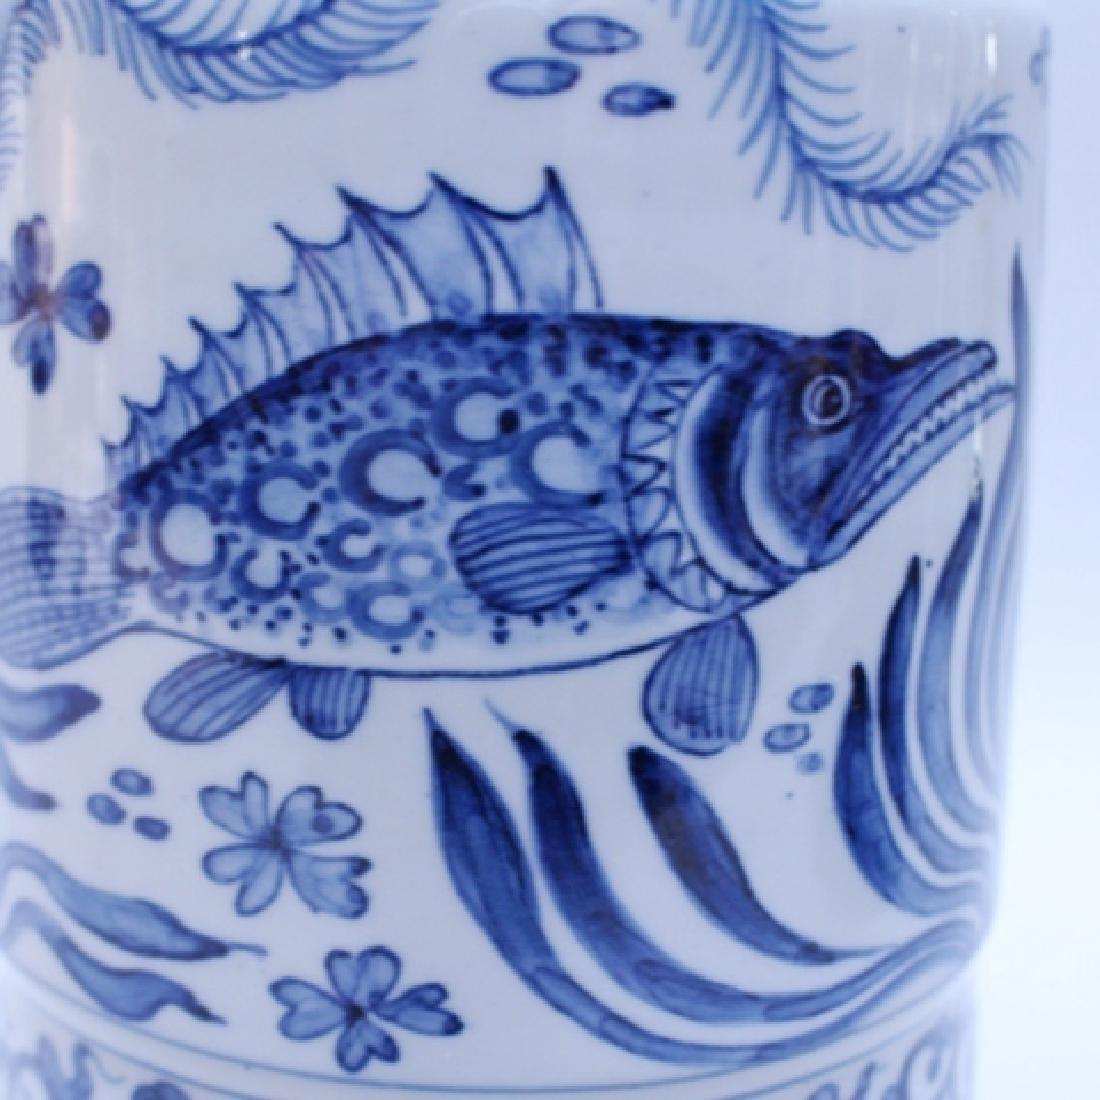 Decorative Blue and White Porcelain Gu Vase - 6